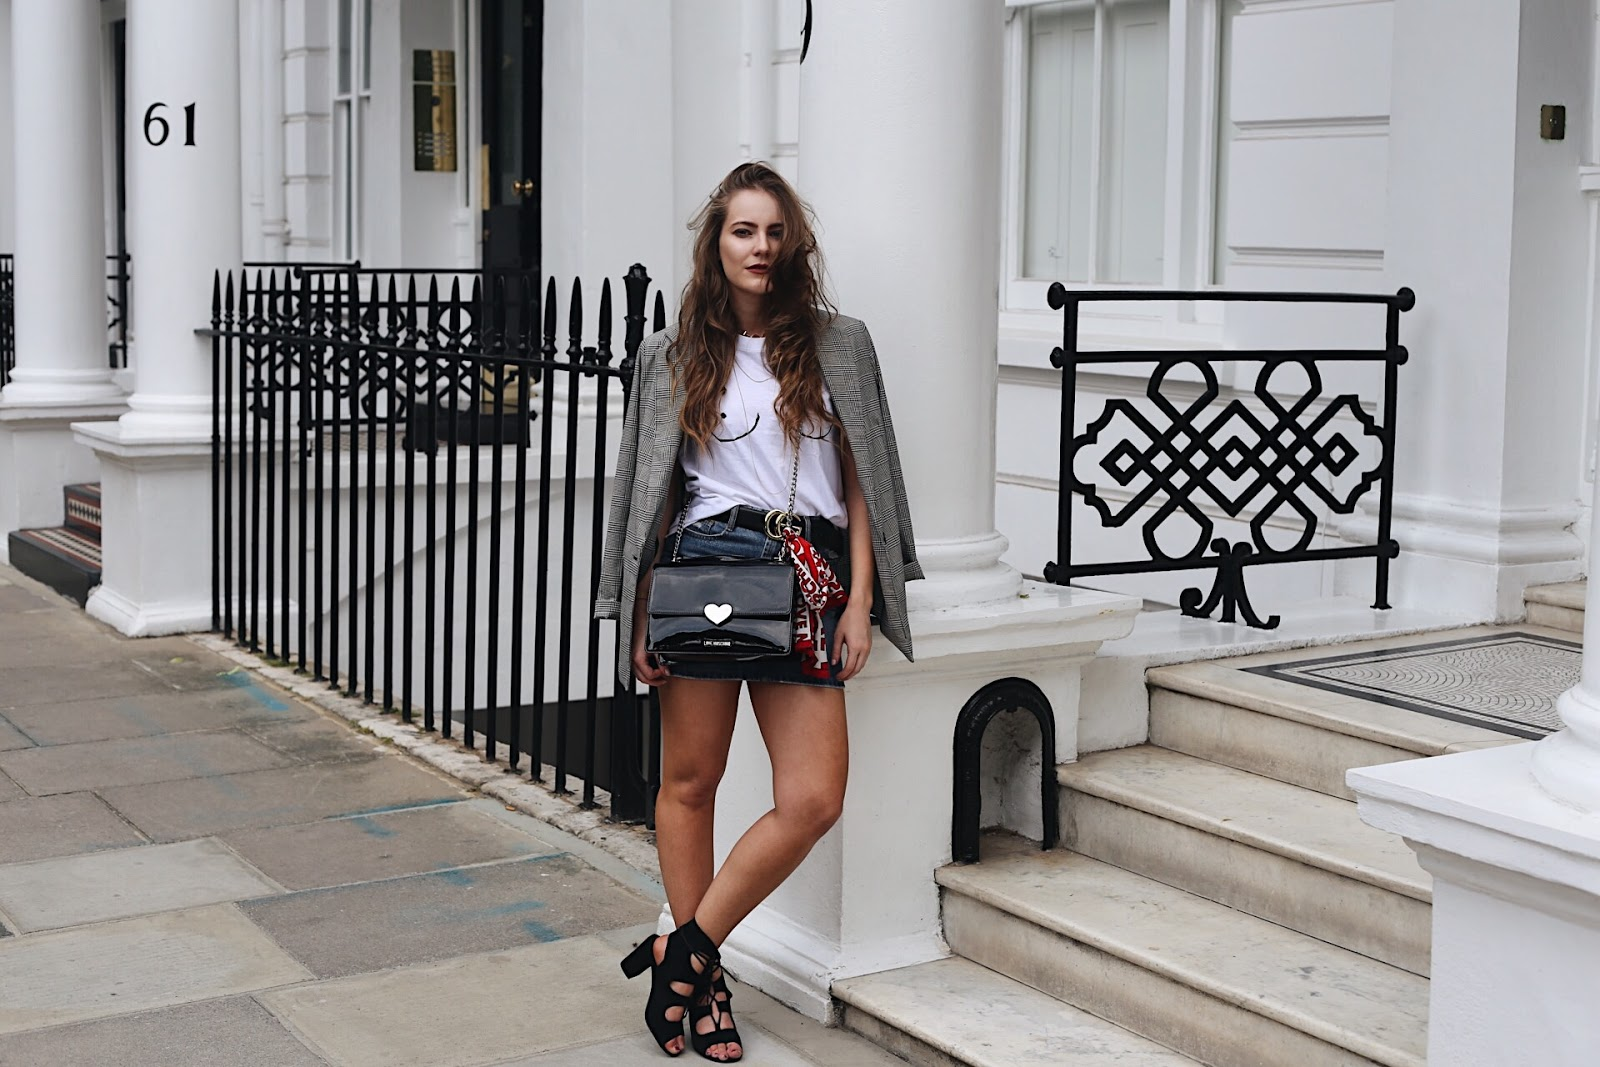 london based fashion blogger, london based style blogger, london based petite blogger, london petite style blogger, petite blogger, petite style blogger, london-based fashion blogger, gucci belt, gucci, gucci belt outfit, denim skirt, boohoo denim skirt, denim skirt outfit inspiration, fashion trend 2017, denim skirt must have, boohoo outfit inspo, boohoo denim, gucci belt, gucci, love moschino bag, love moschino, bershka blazer, underboob top, how to blog successfully, blogging tips, how to take blog photos, blogging 101, tips for blogging